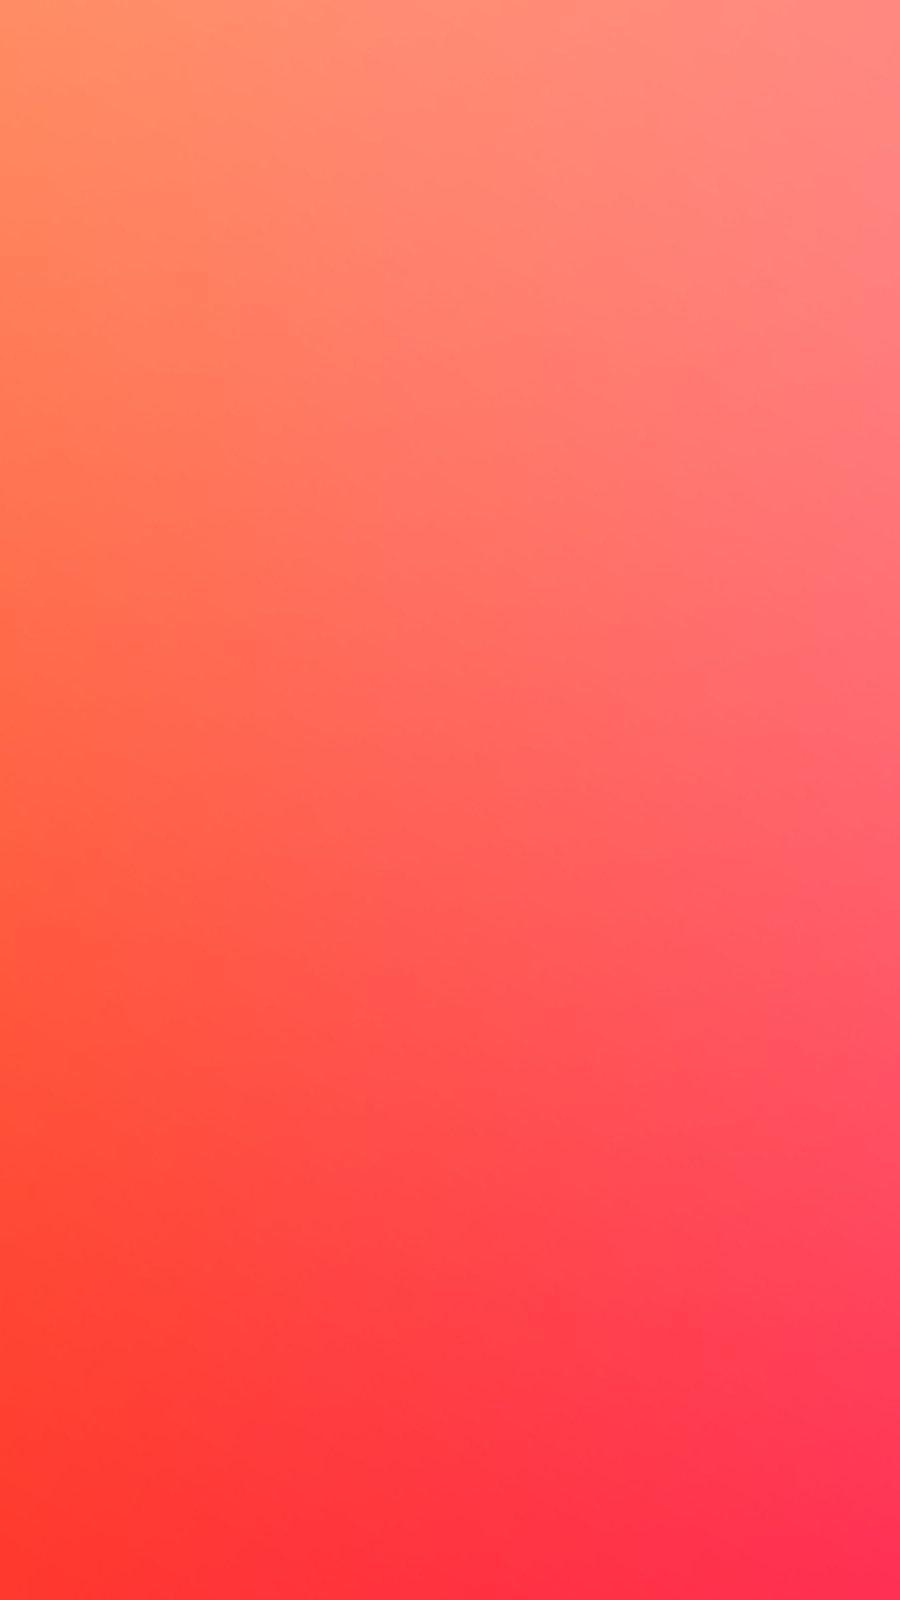 Orange Iphone Wallpapers Top Free Orange Iphone Backgrounds Wallpaperaccess